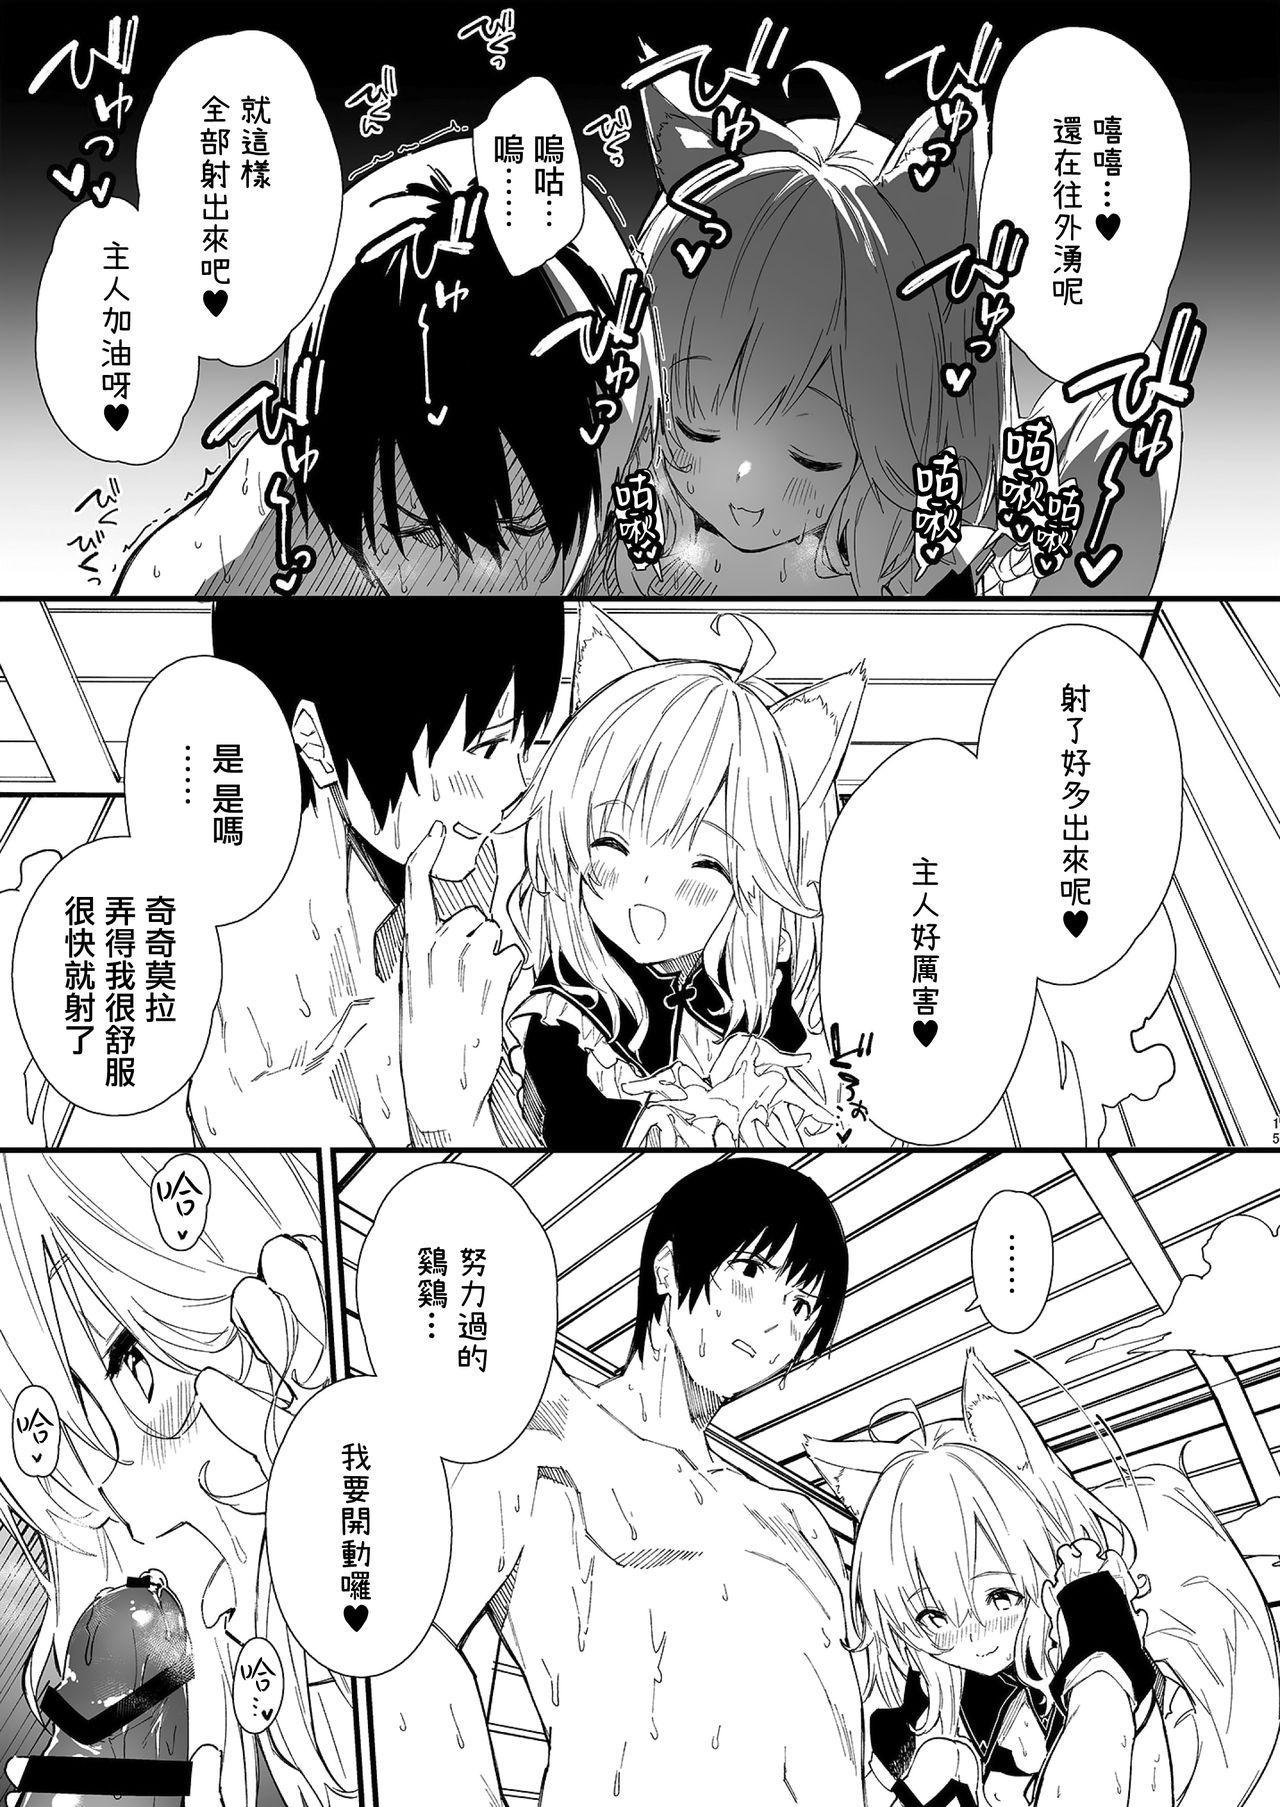 Kemomimi Maid to Ichaicha suru Hon 13